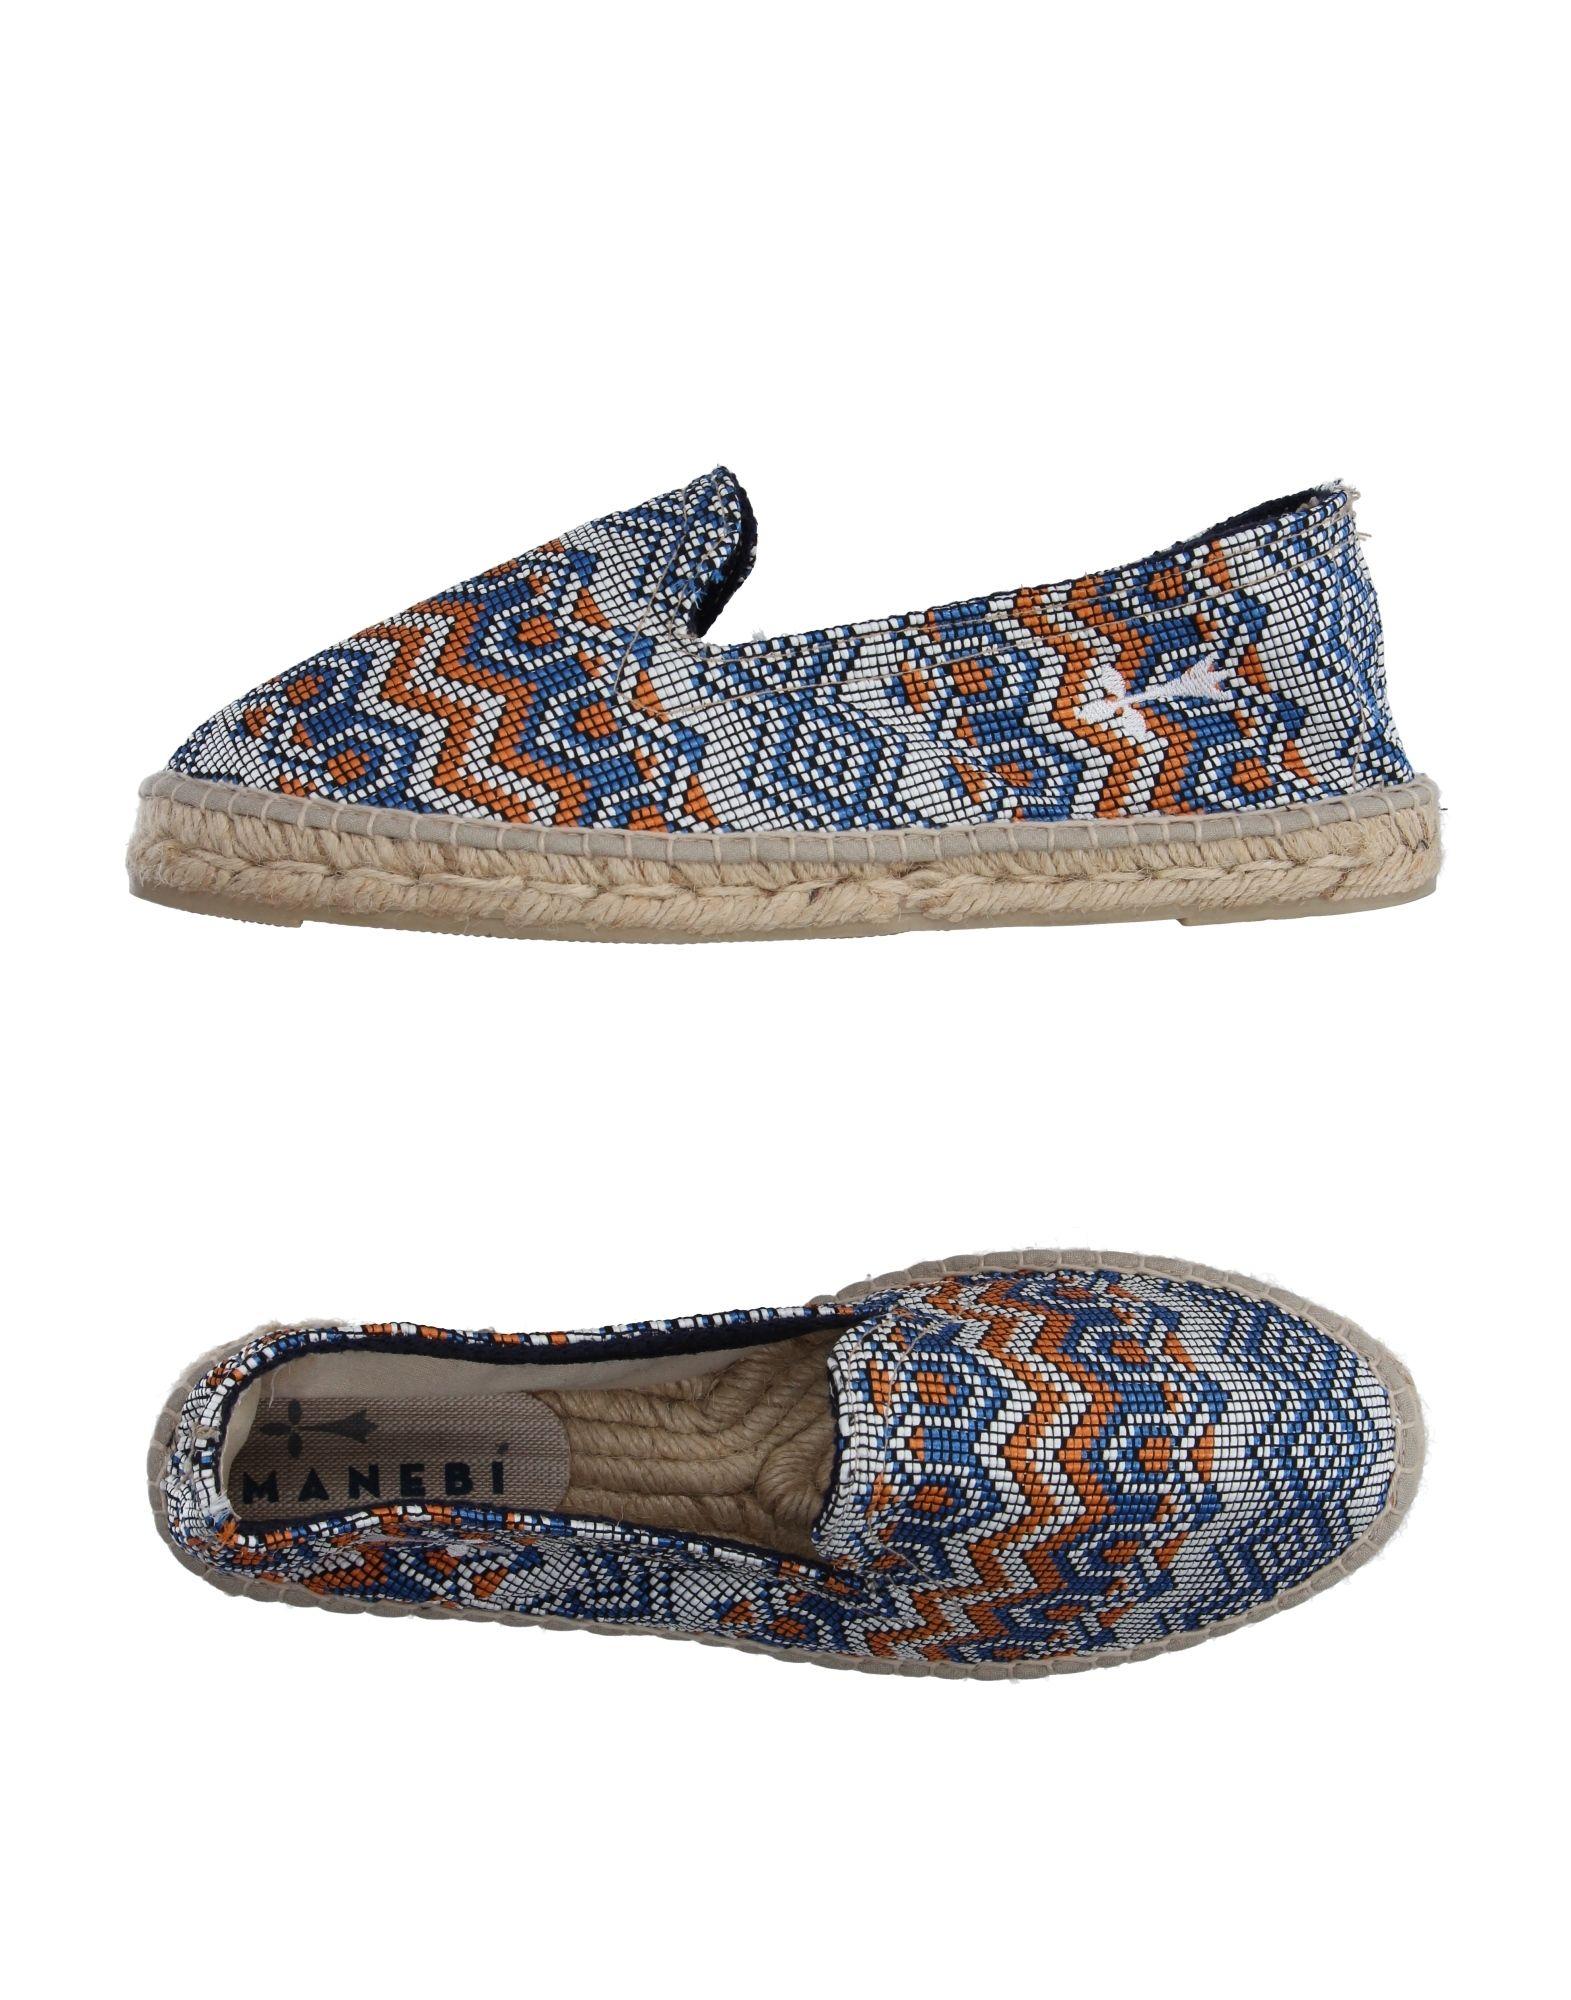 Manebí Schuhe Espadrilles Damen 11111258EJ Gute Qualität beliebte Schuhe Manebí 3b6f69